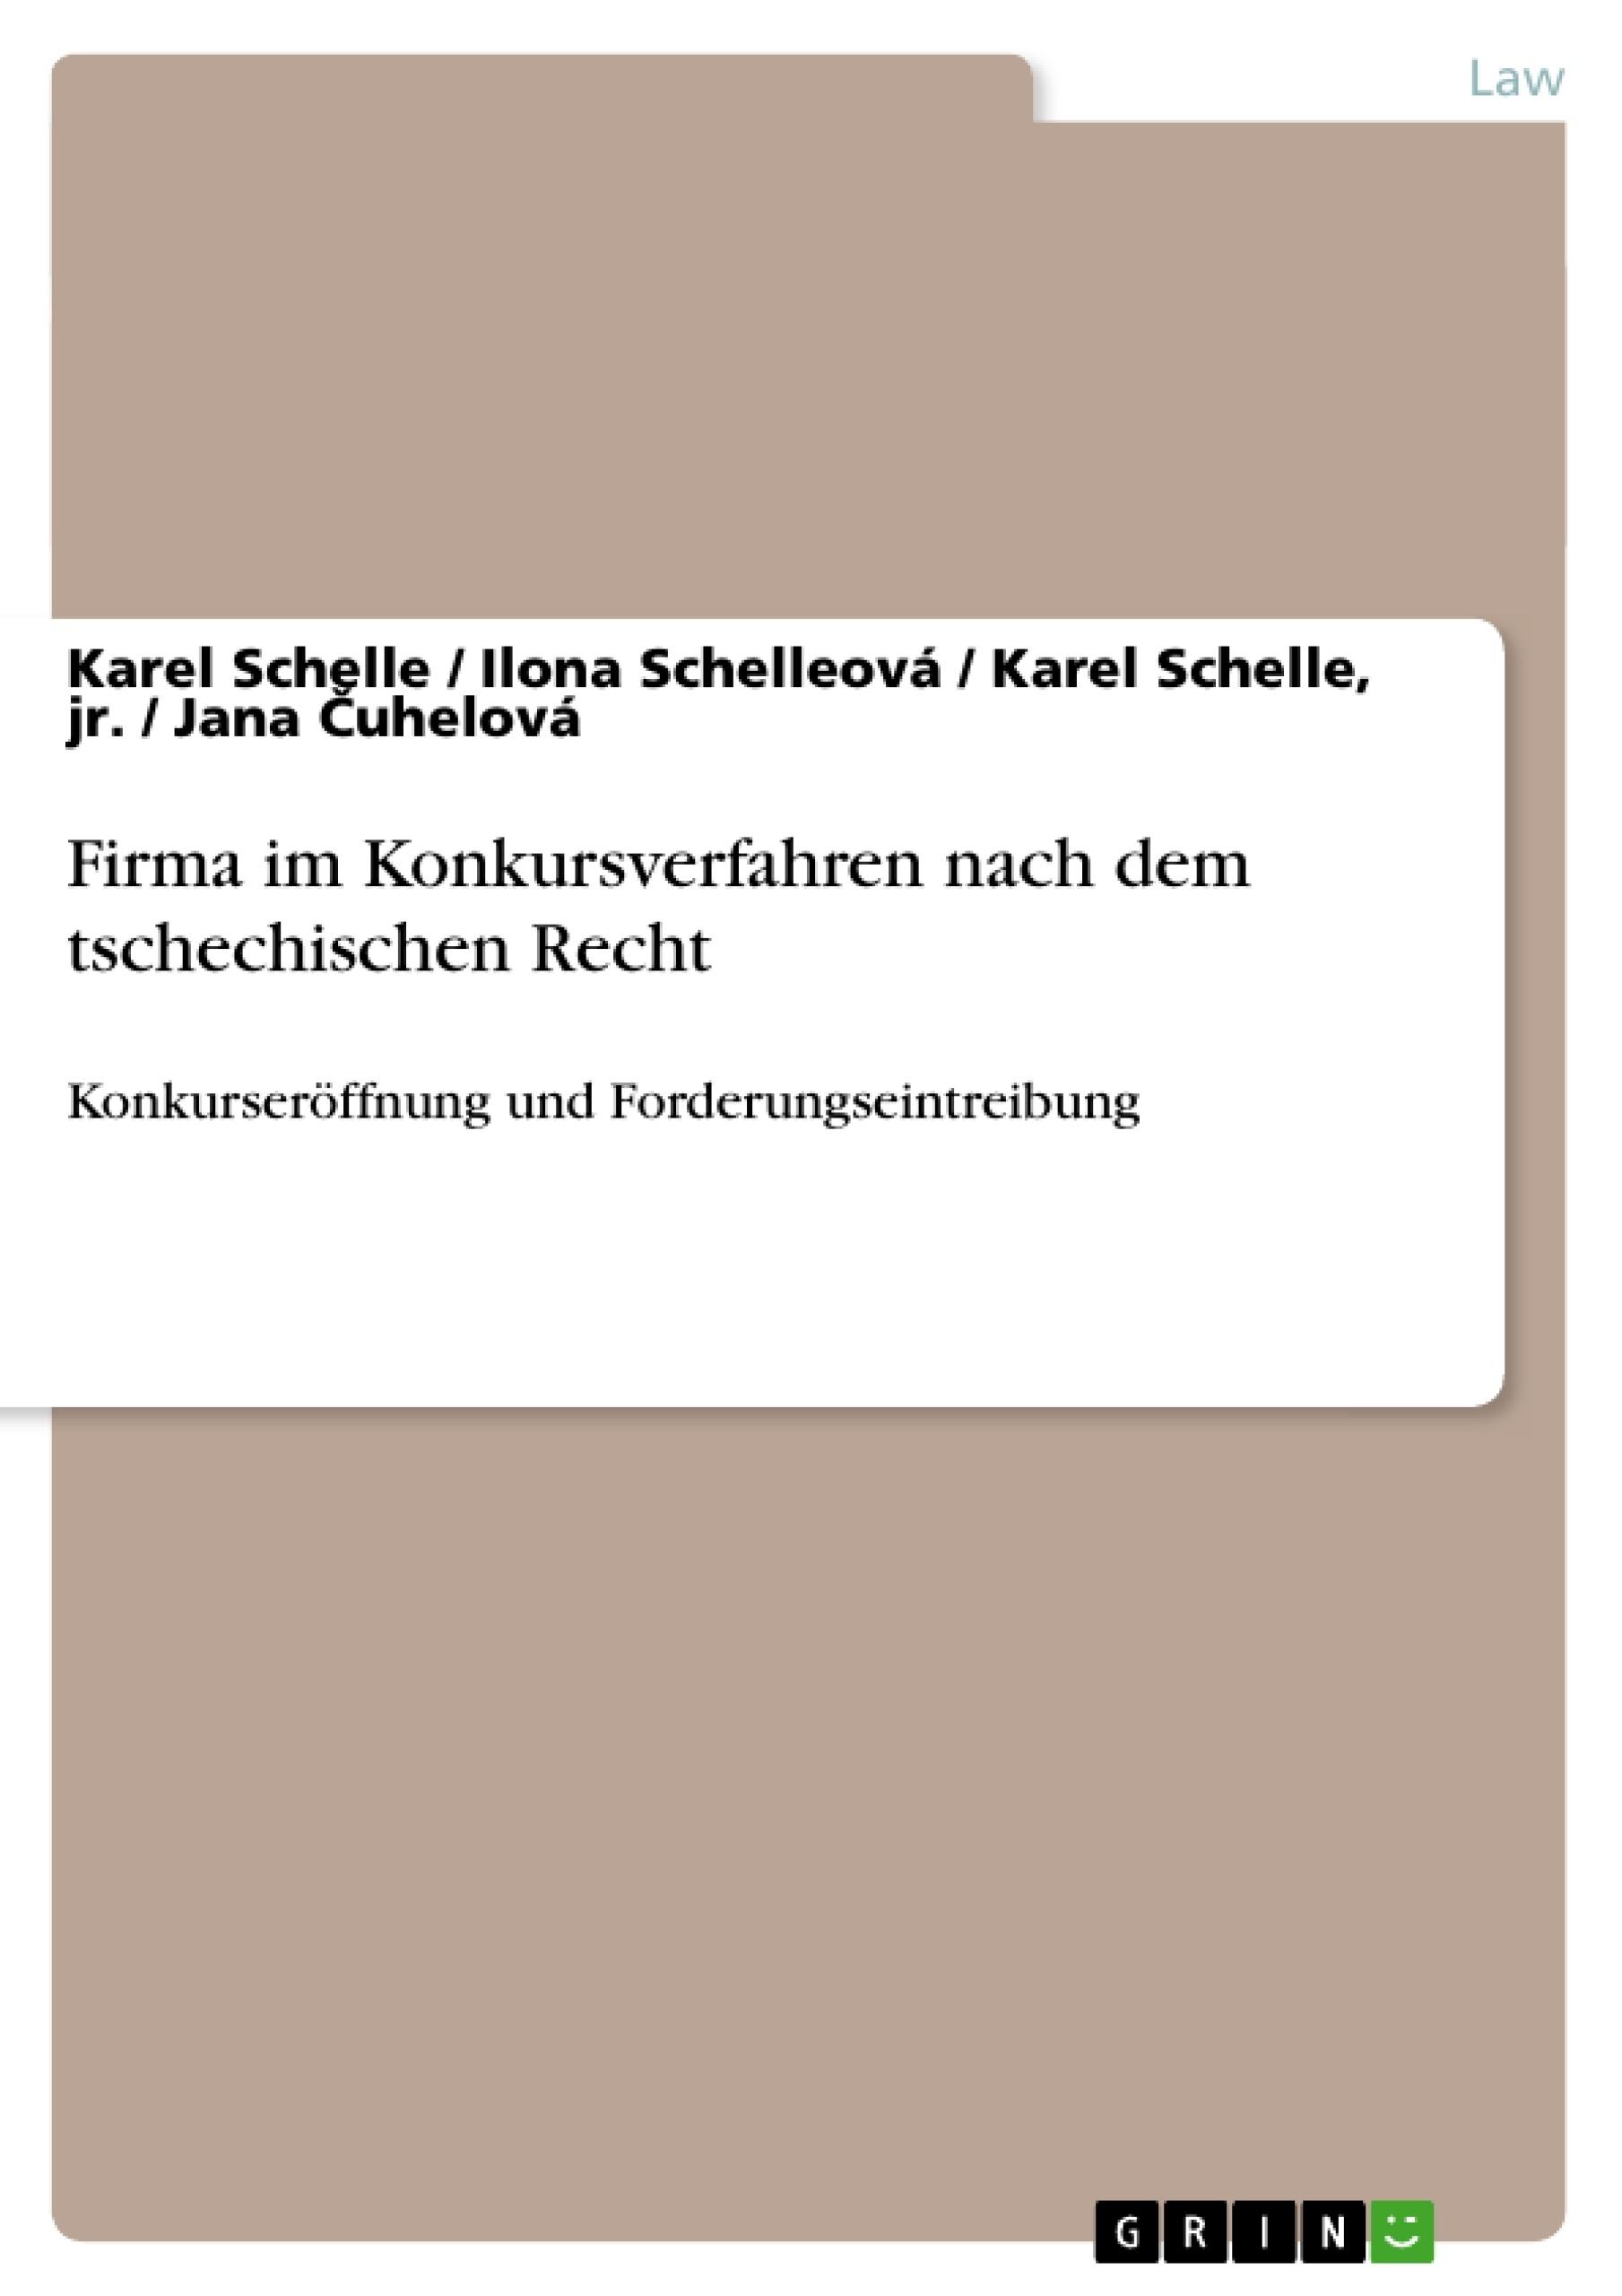 Title: Firma im Konkursverfahren nach dem tschechischen Recht